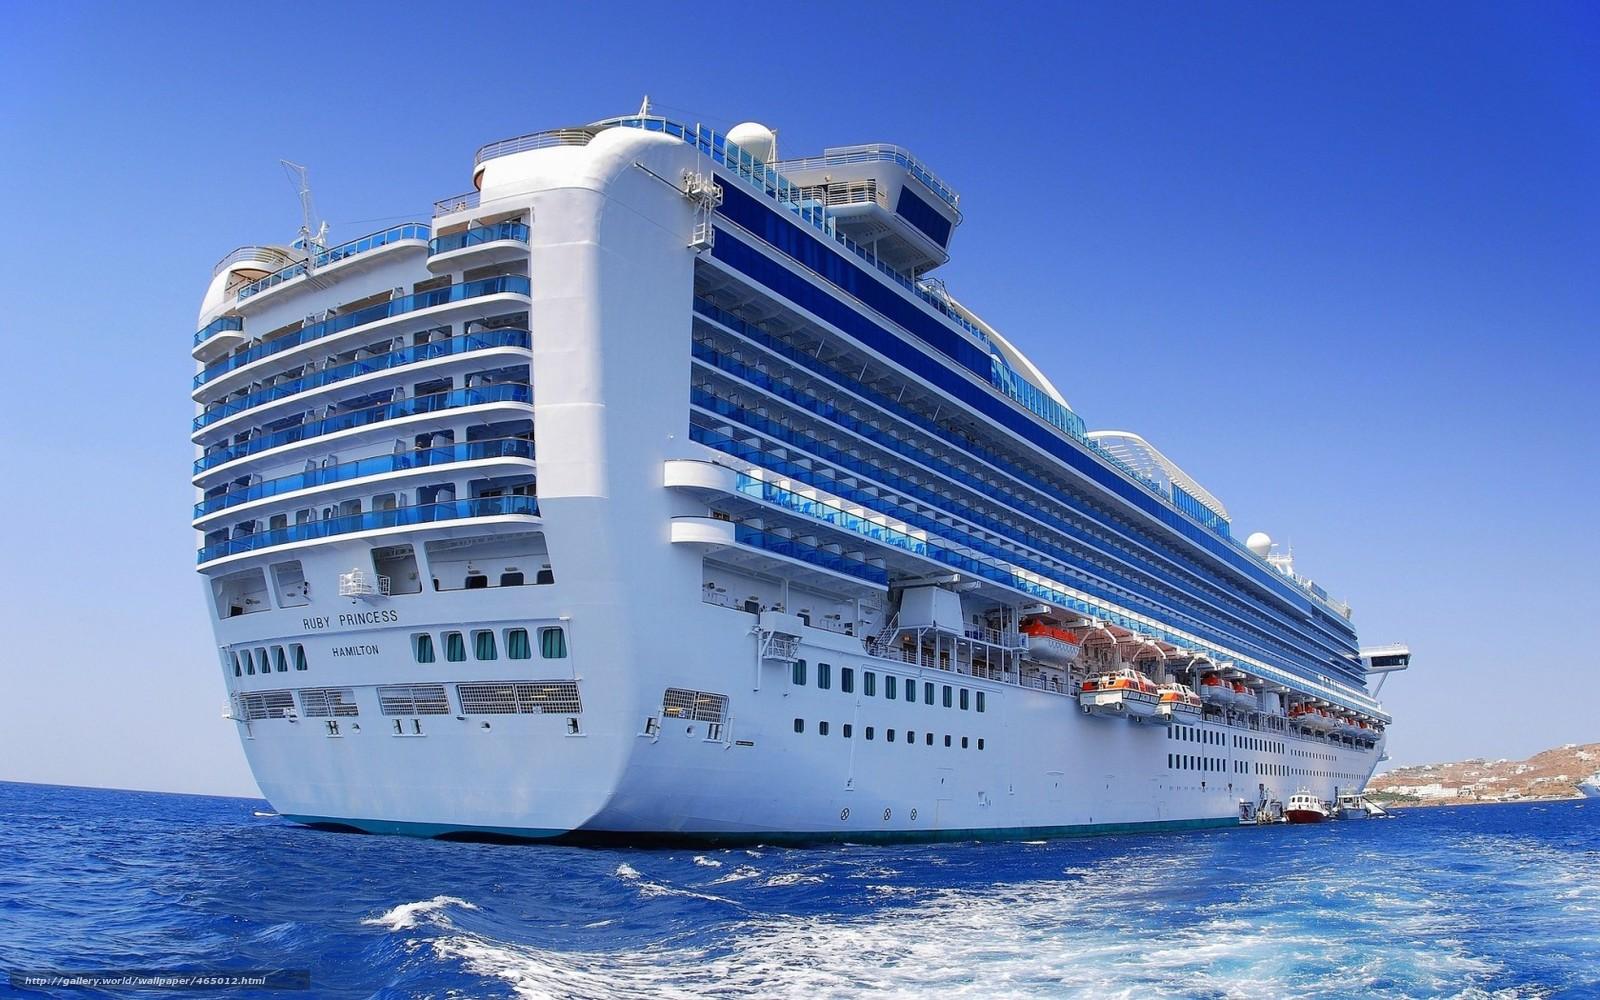 Download wallpaper ship Cruise Ship ocean desktop wallpaper in 1600x1000